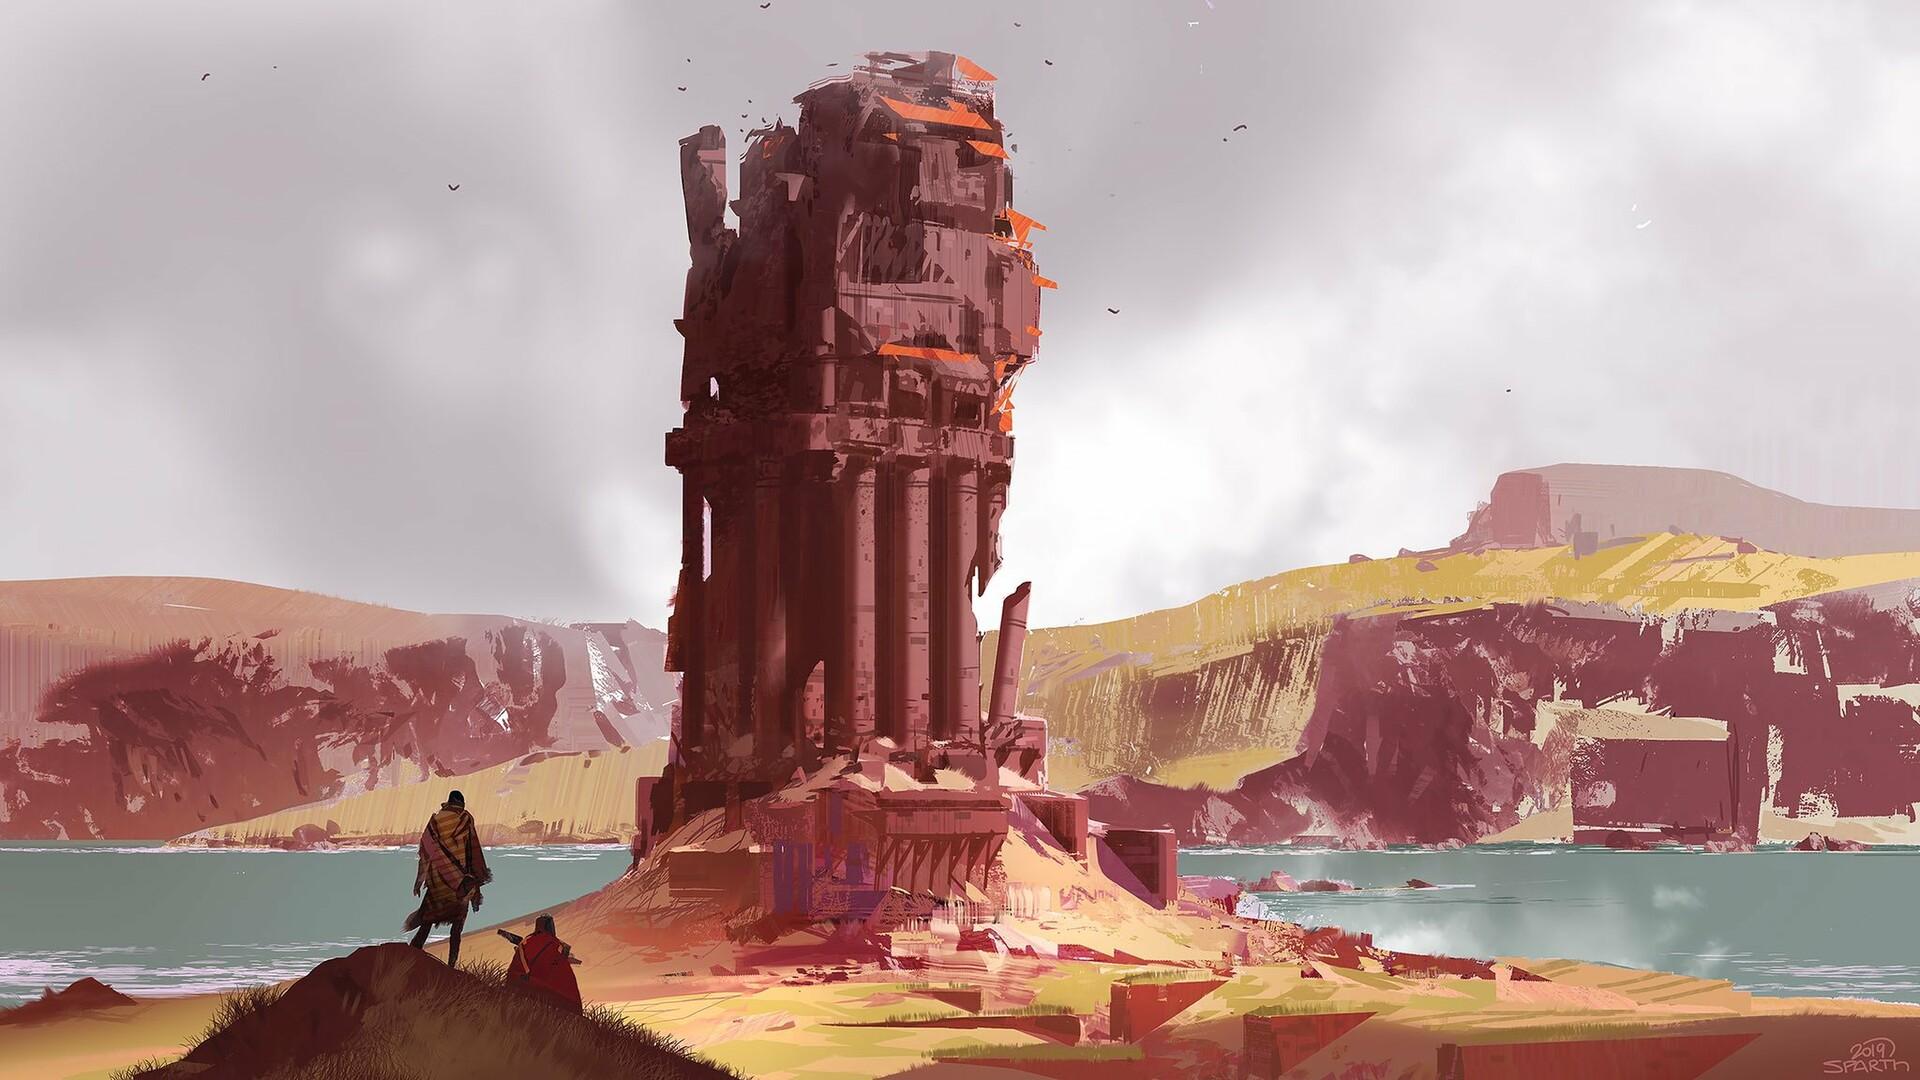 Sparth sparth tower